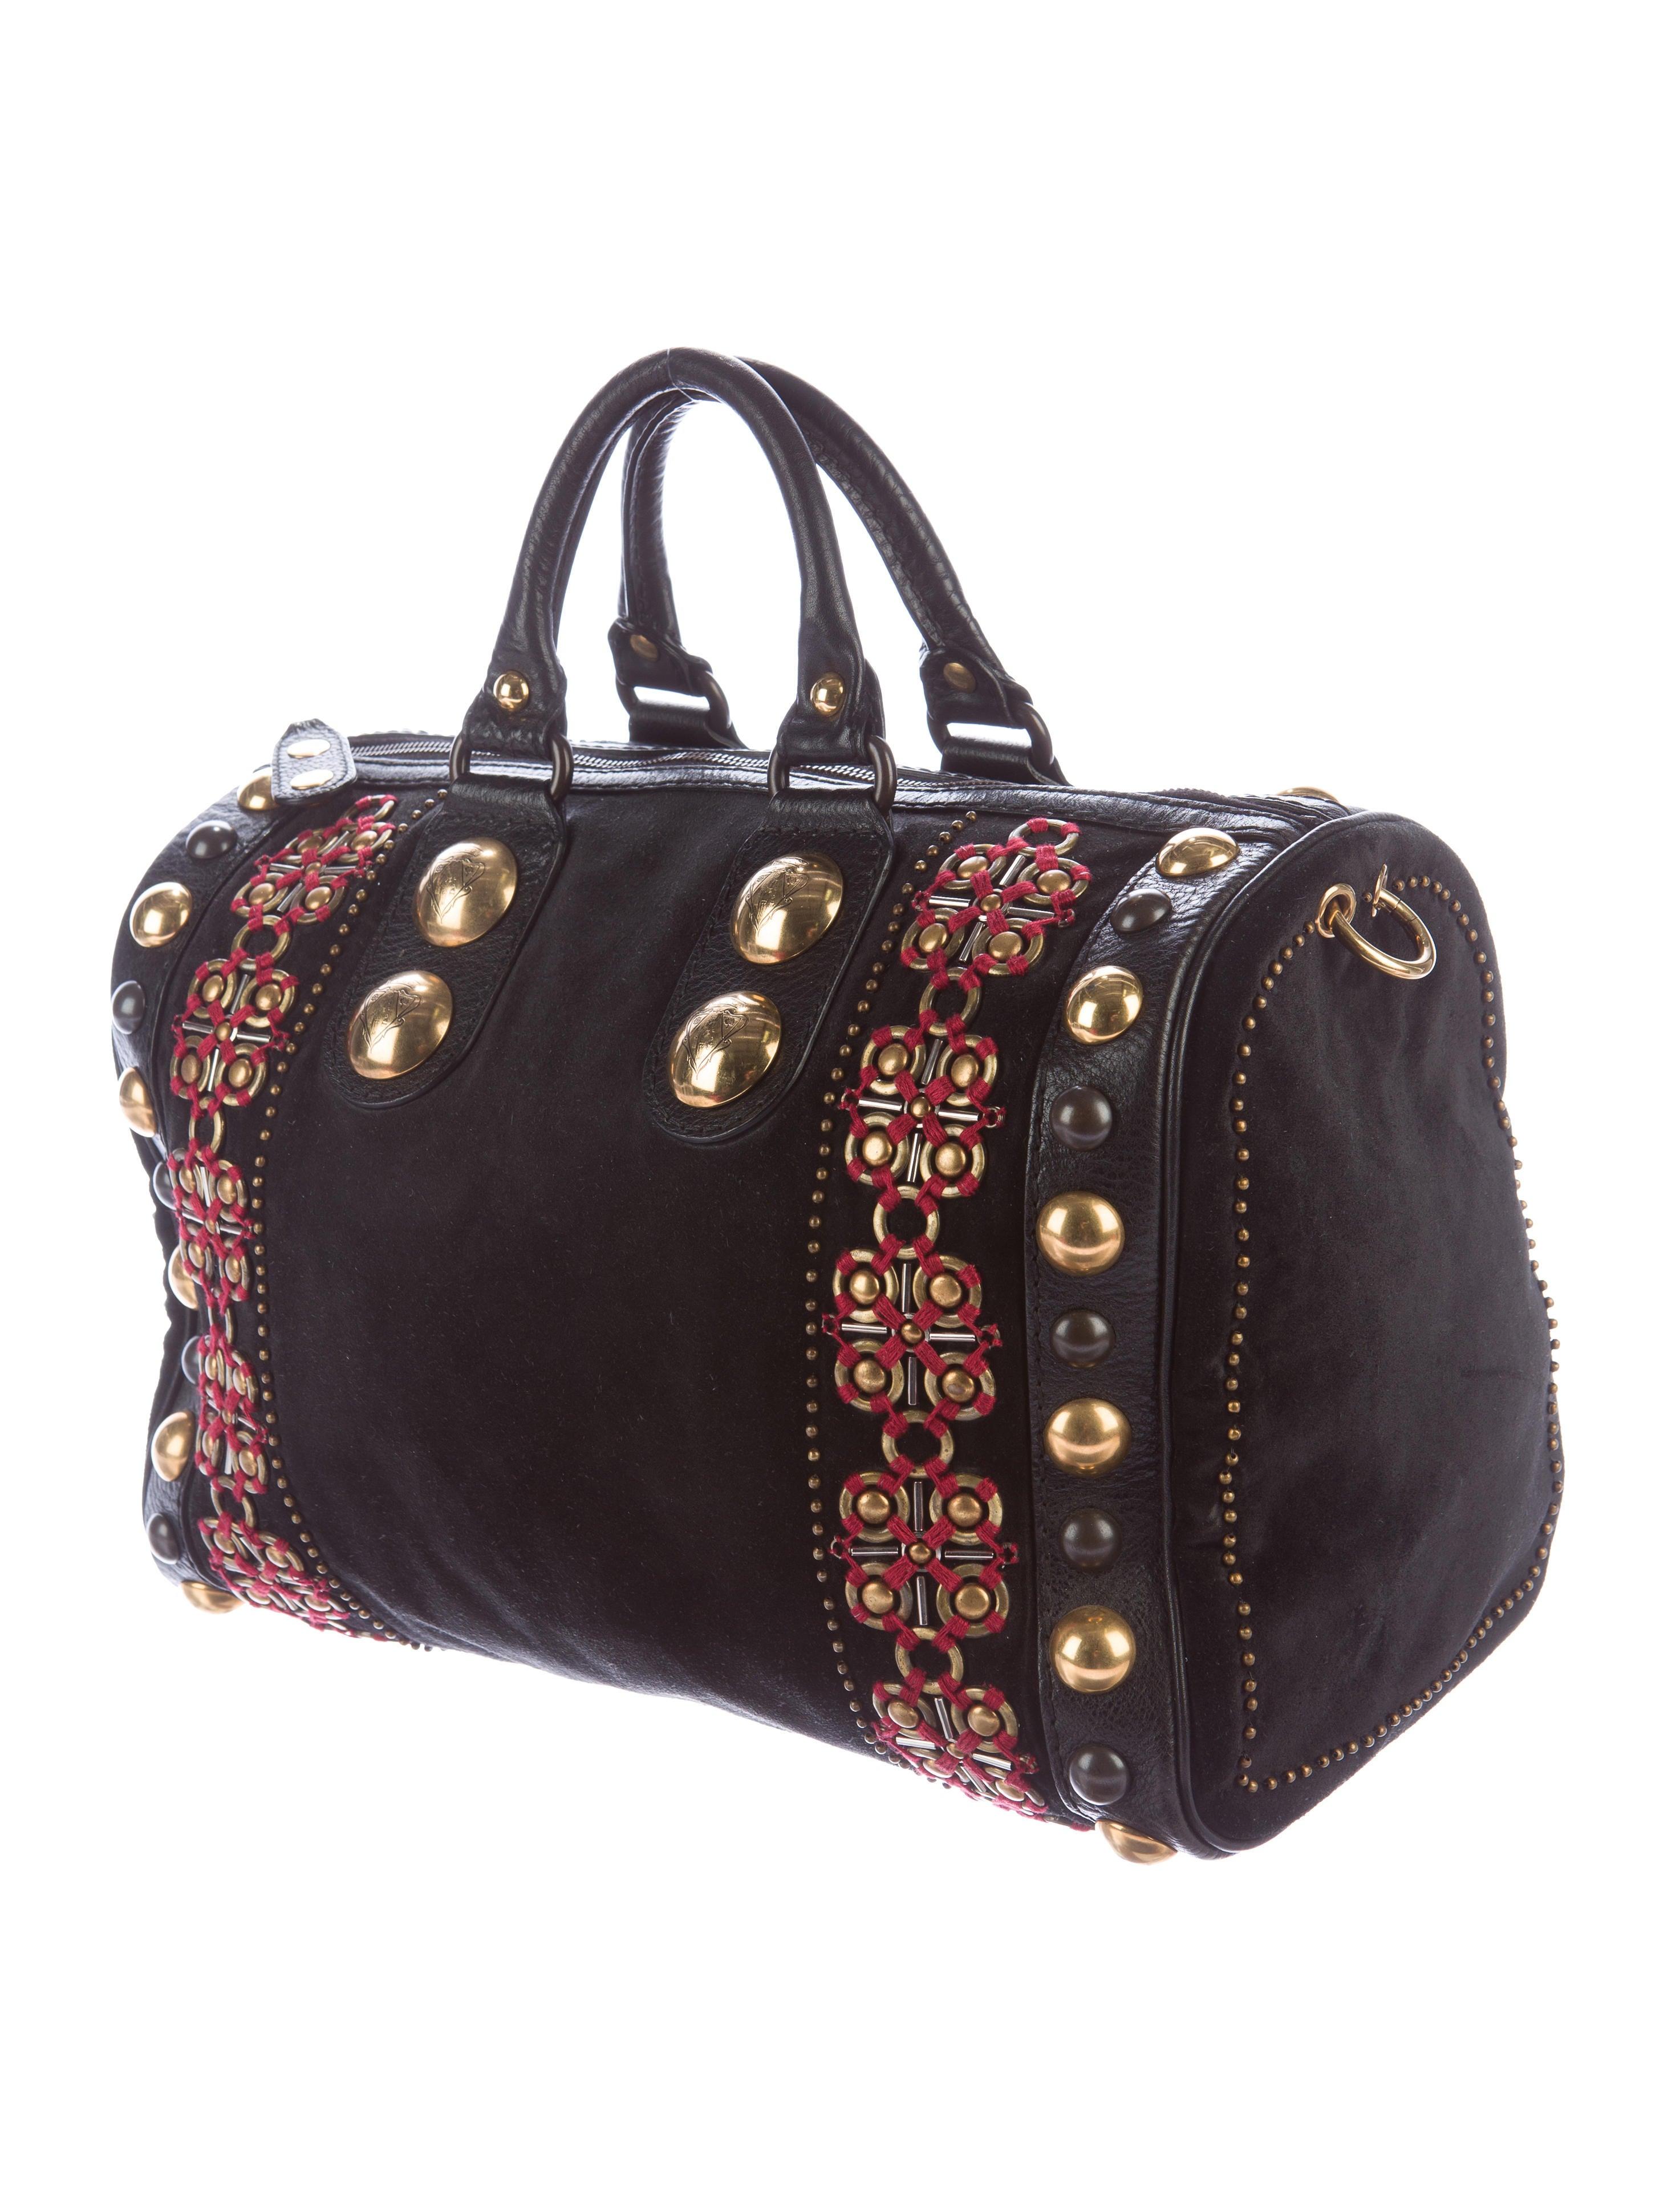 Boston Bag Patchwork Tutorial: Gucci Large Suede Babouska Boston Bag